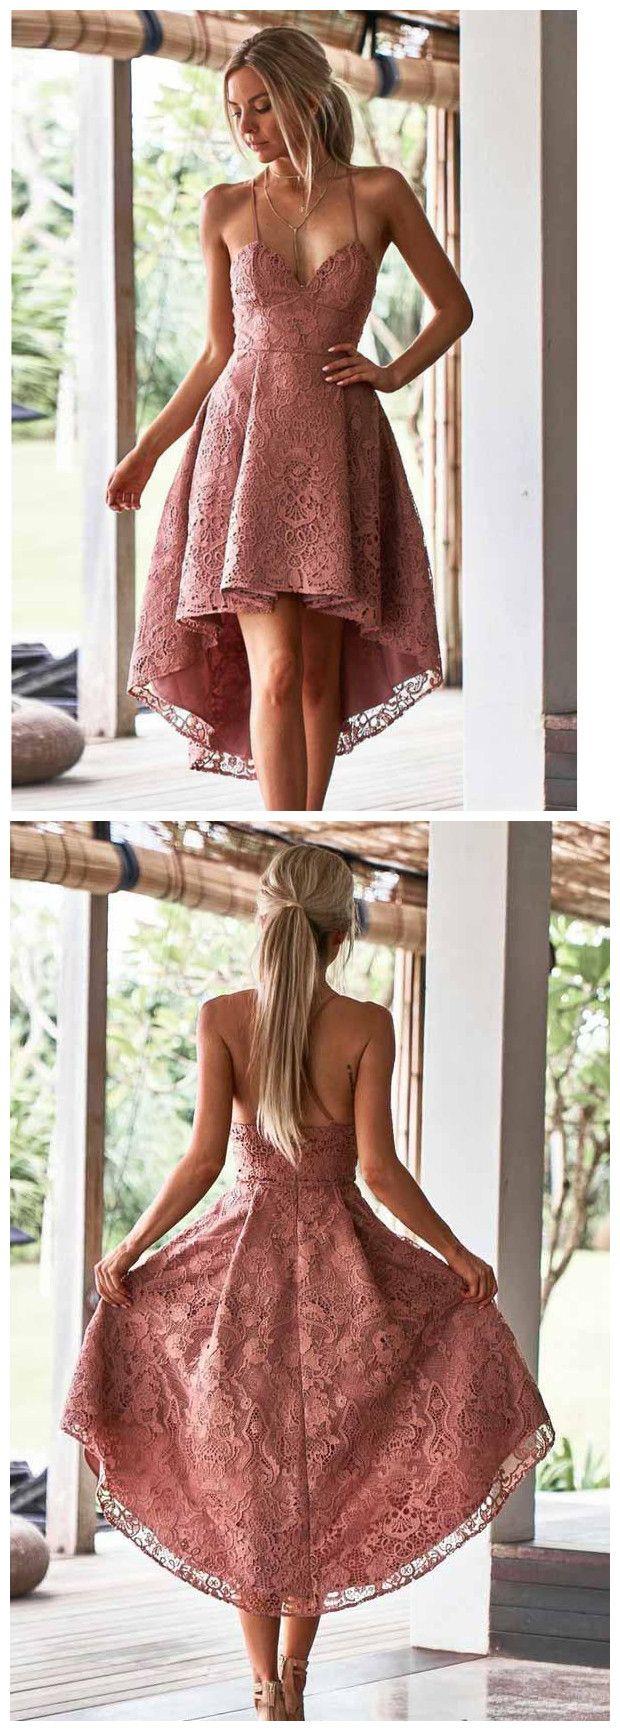 Aline spaghetti straps high low blush lace short prom dress